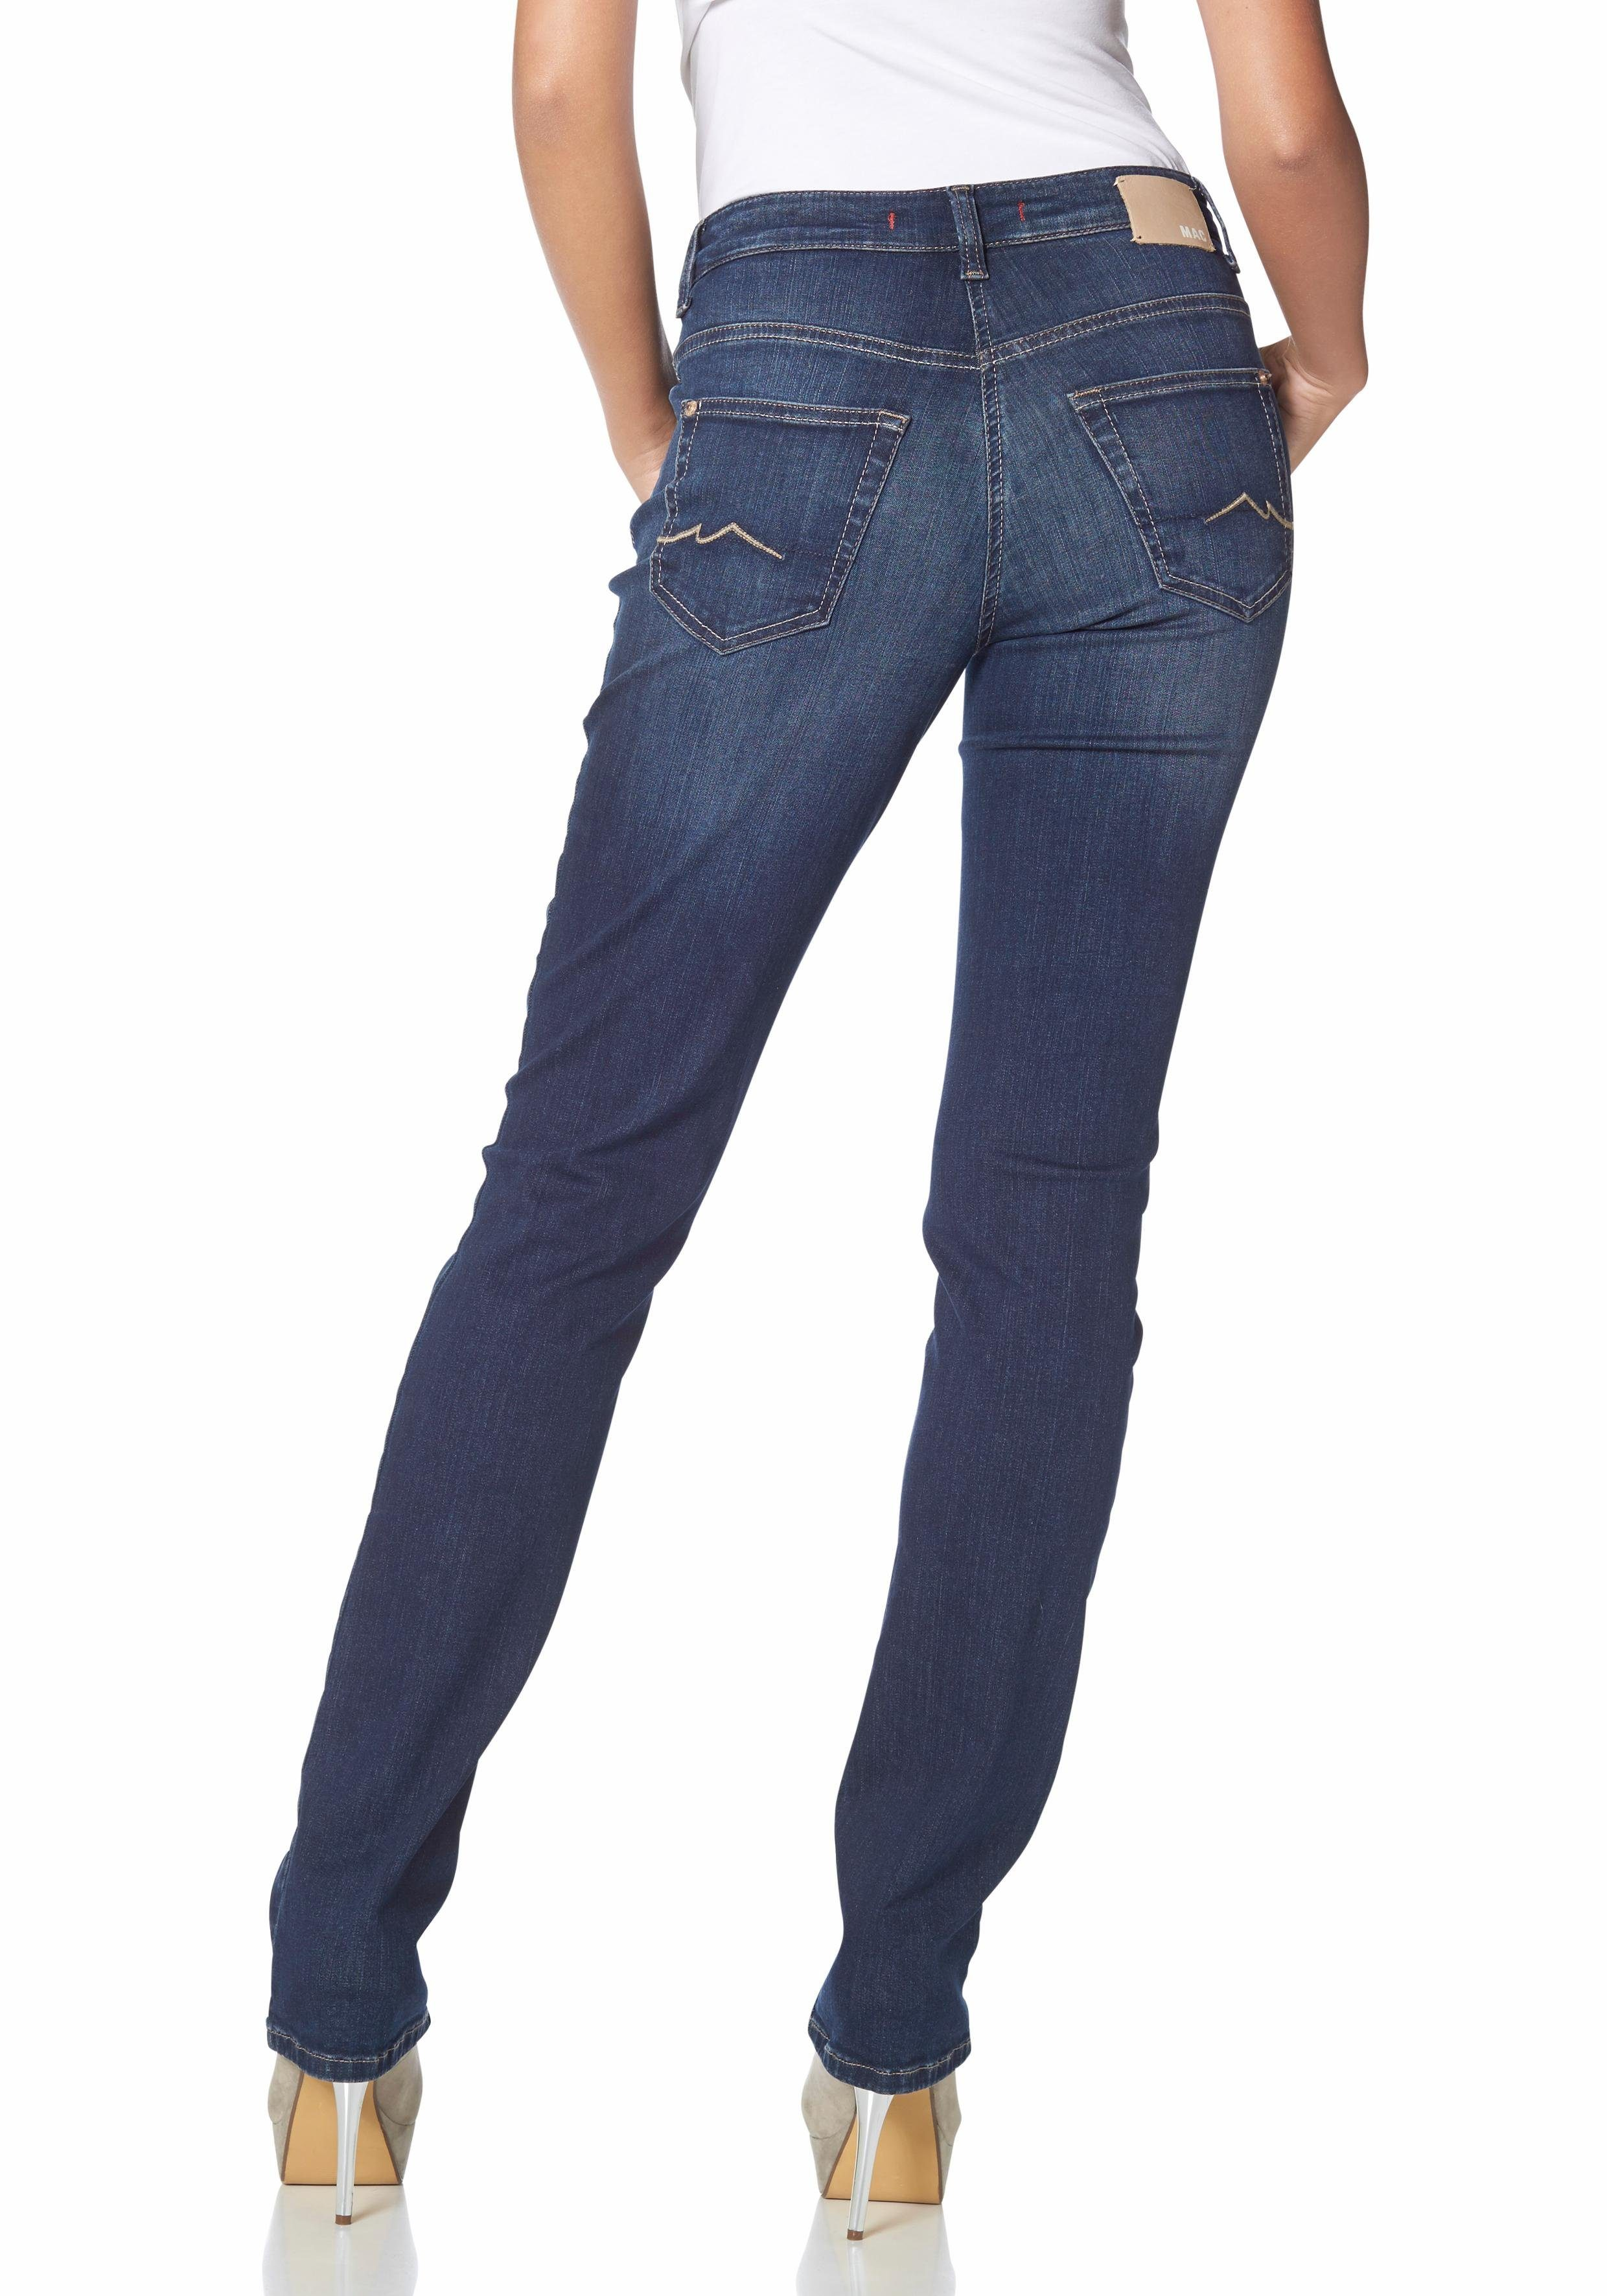 ANGELS  Skinny Stern Jeans Gr.36,38,42,44,46 Regular Stretch 2 Farben NEU